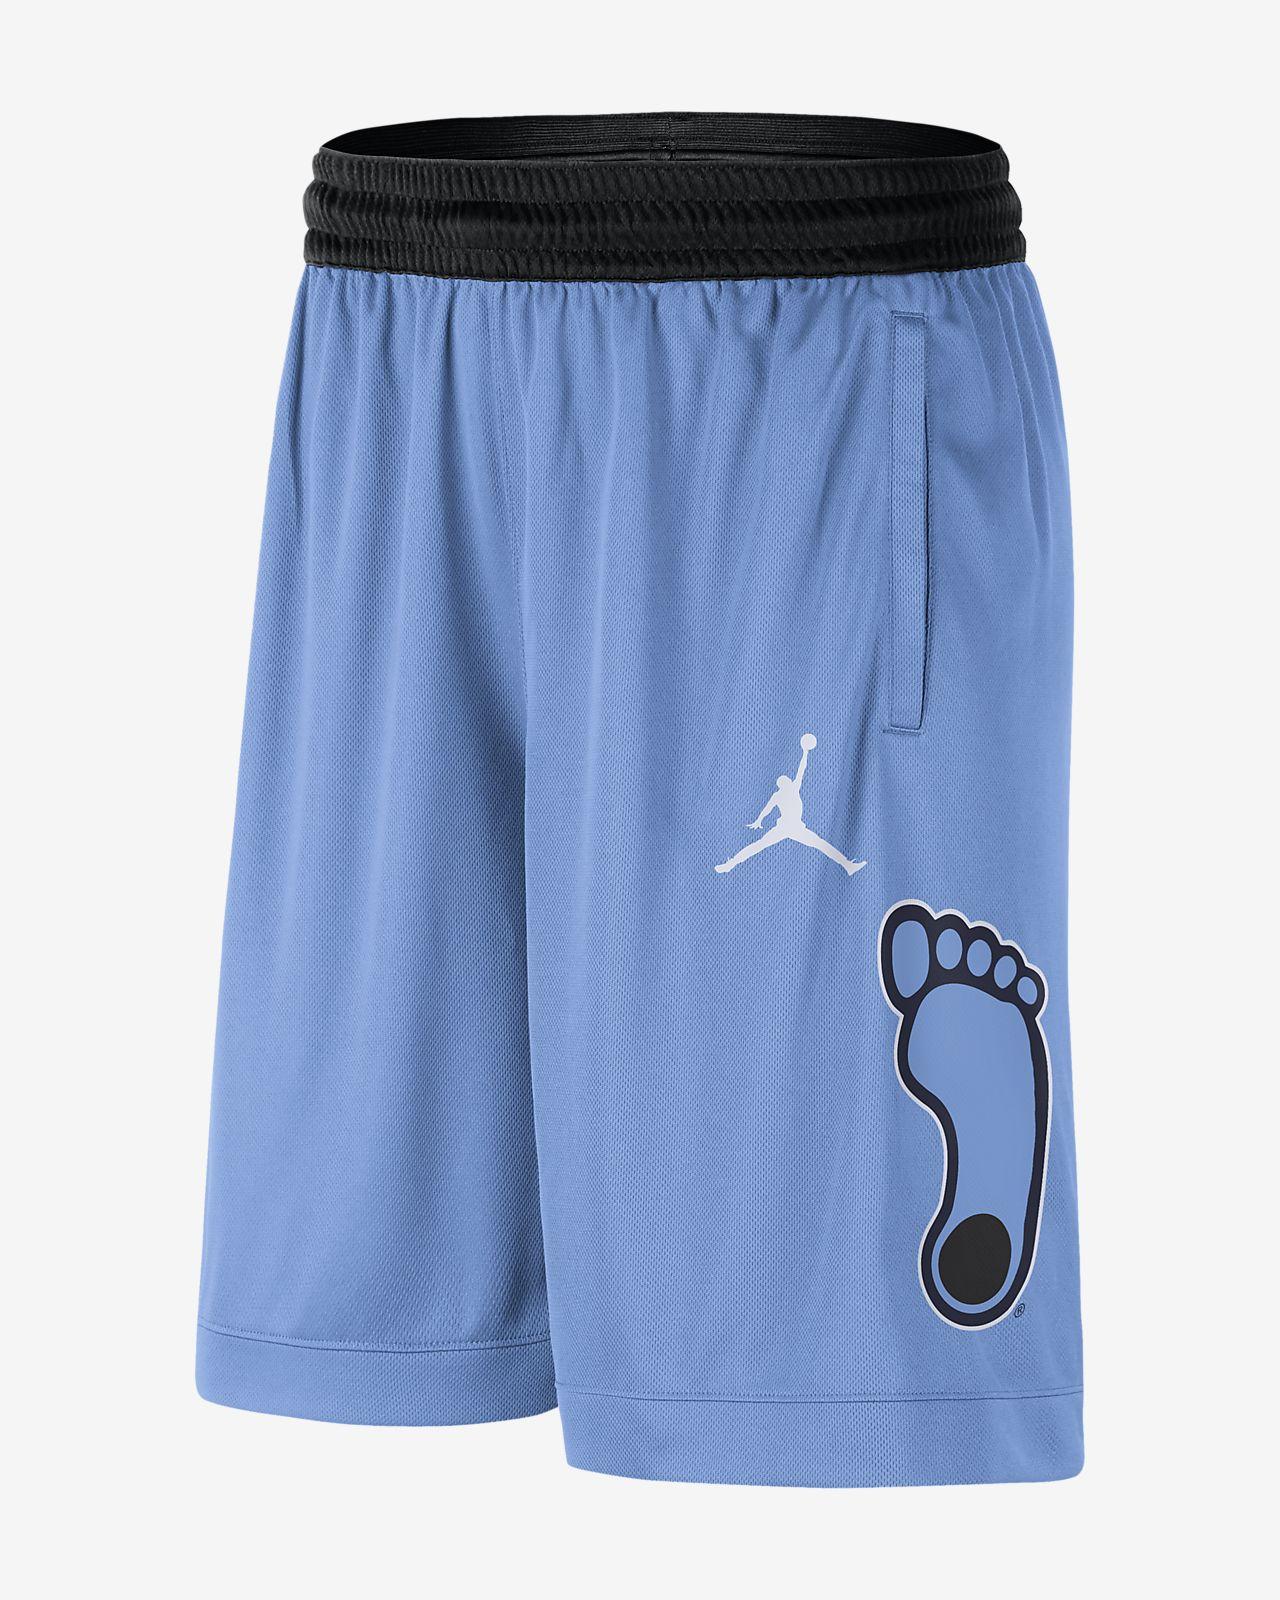 Jordan College Dri-FIT (UNC) Men's Basketball Shorts